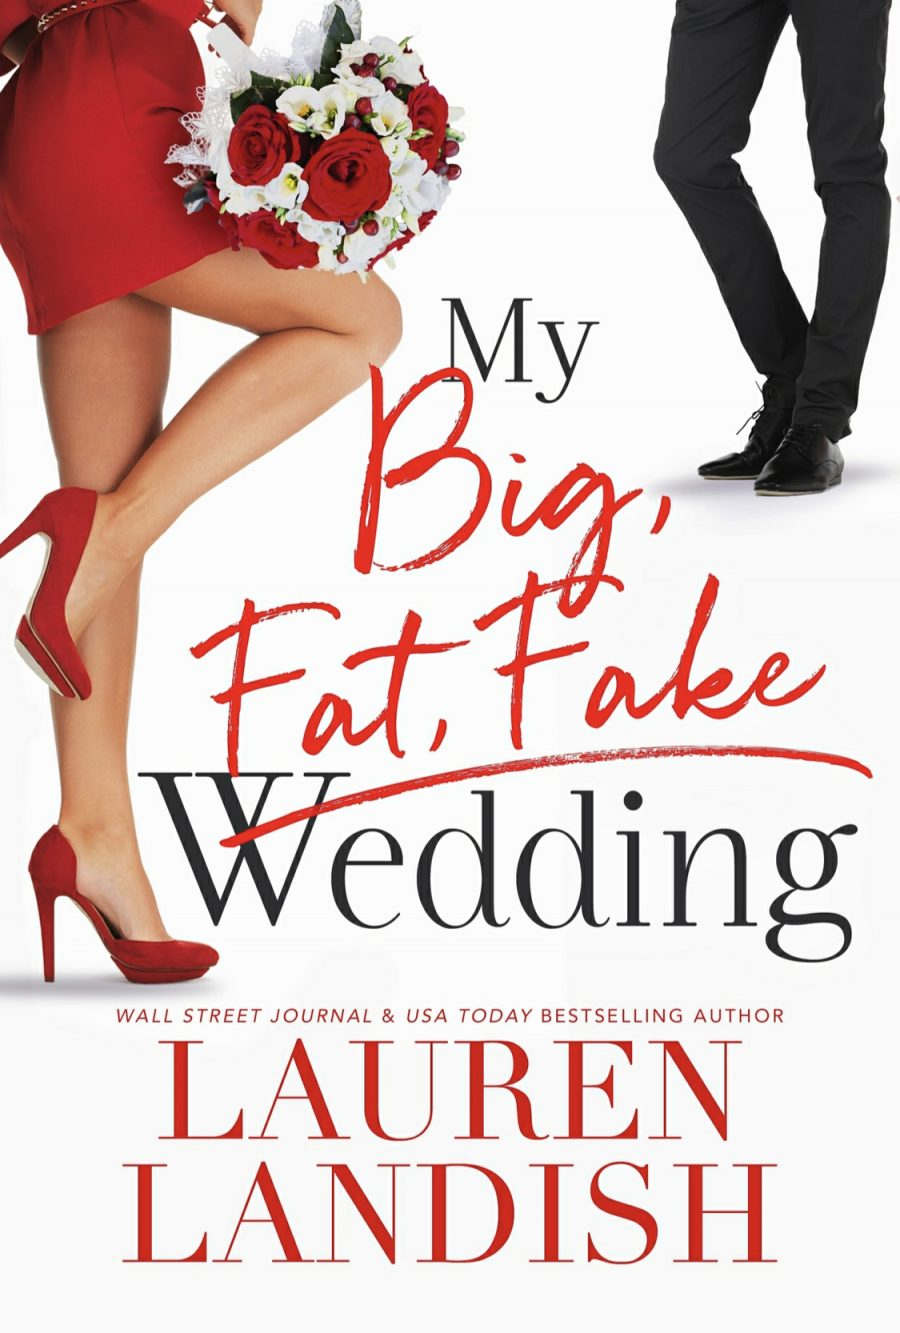 My Big Fat Fake Wedding by Lauren Landish - A Book Review #BookReview #Contemporary #ContemporaryRomance #HEA #KindleUnlimited #KU